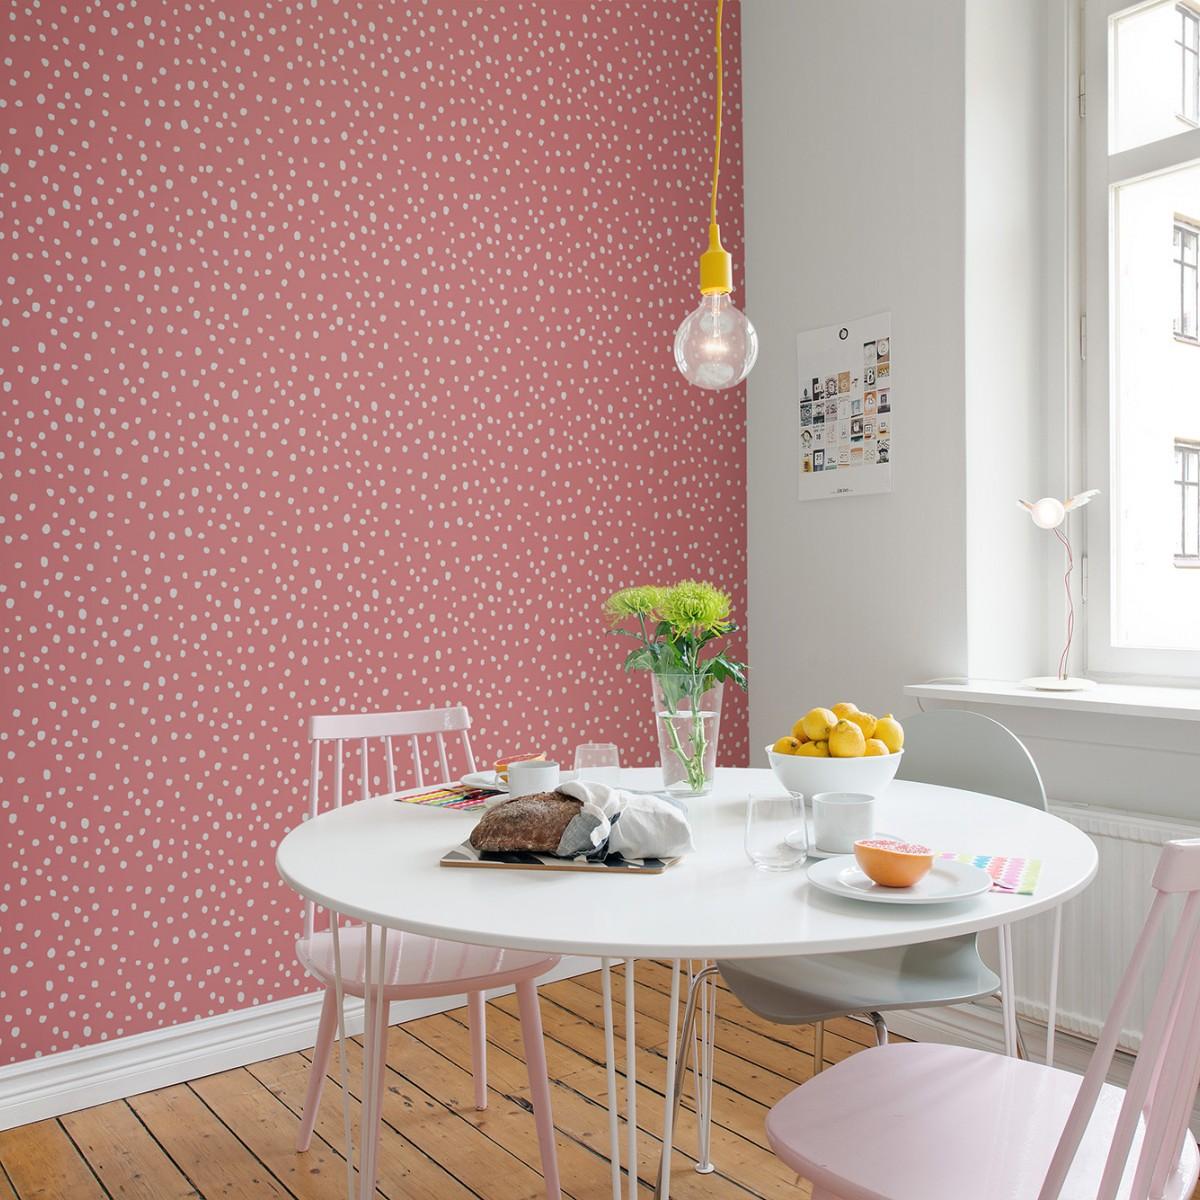 Foto tapet Rebel Dot, Peach, personalizat, Rebel Walls